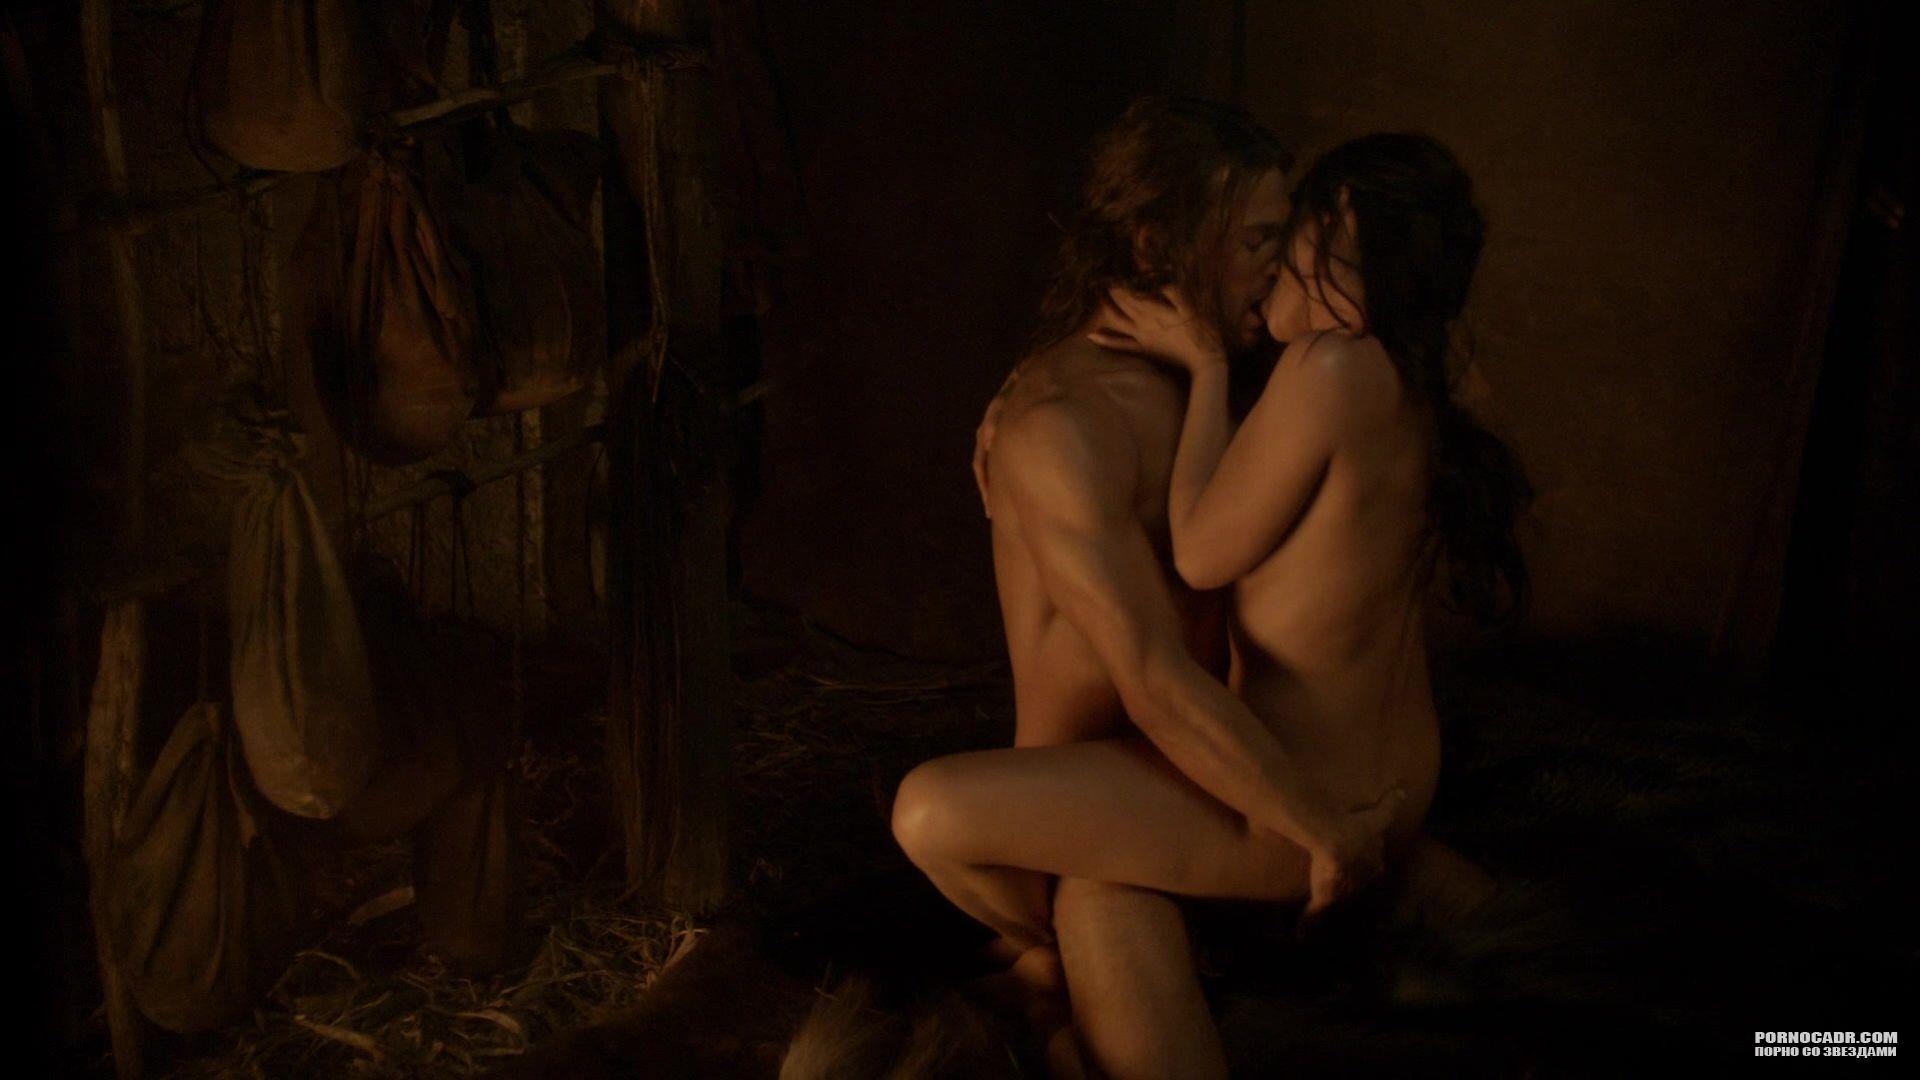 eroticheskie-filmi-virezannie-otkrovennie-momenti-sekretarshu-na-stole-szadi-video